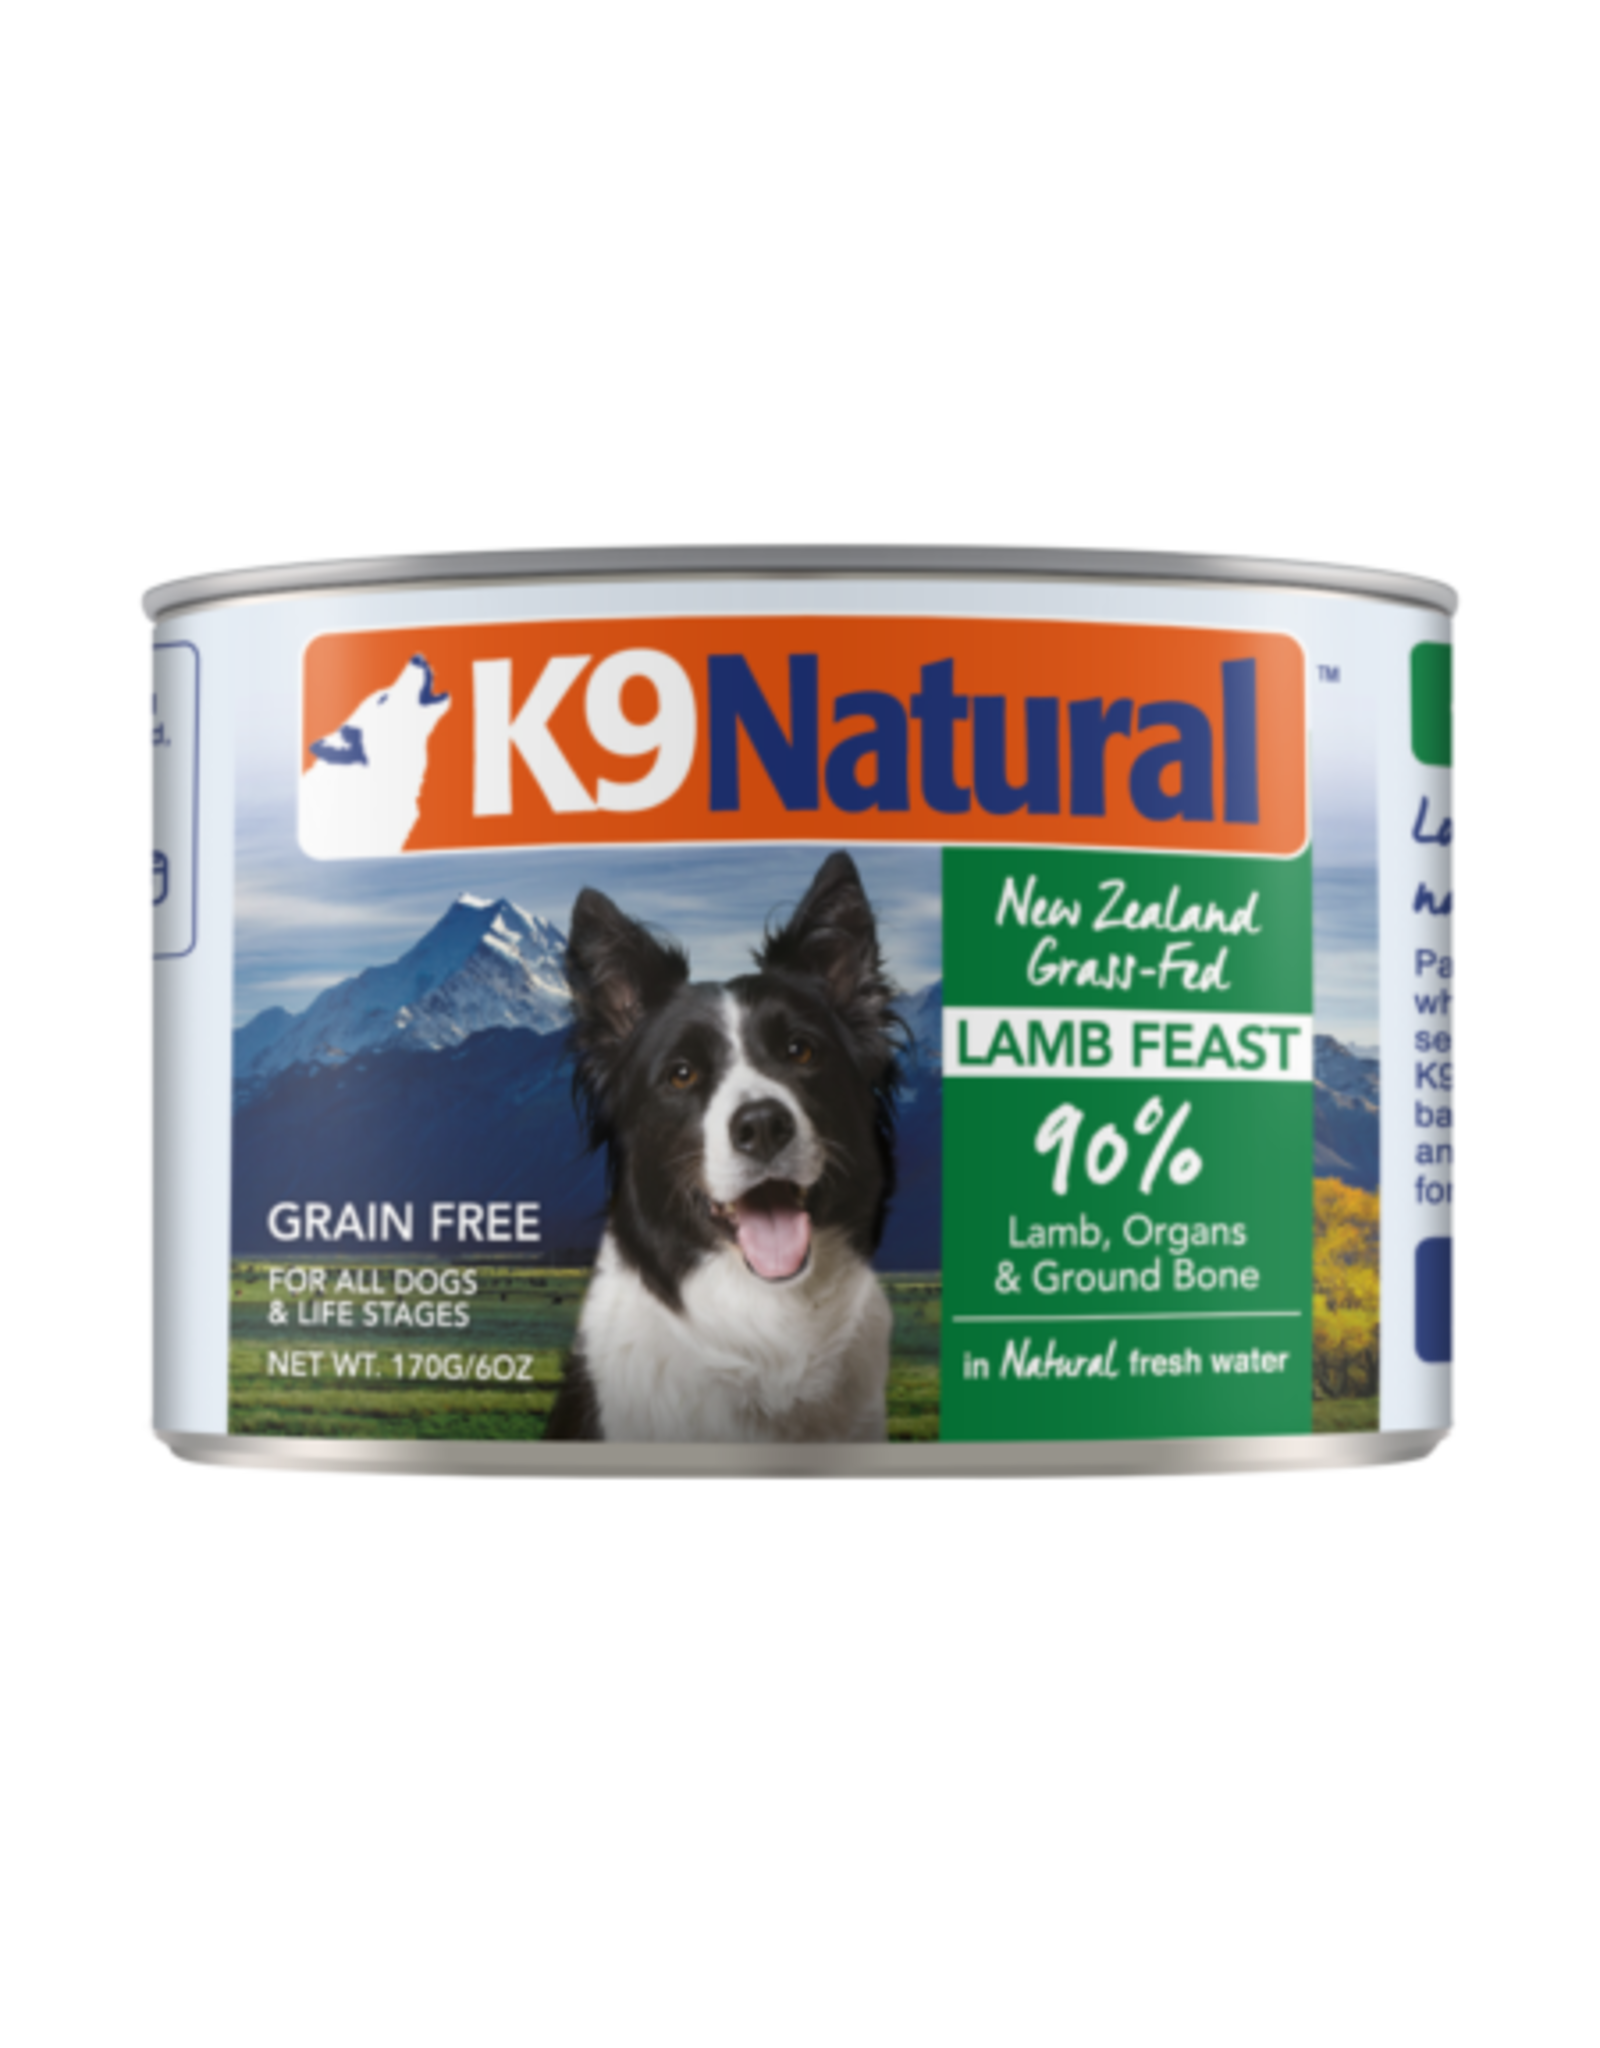 K9 Natural K9 Natural Lamb Feast Dog Food 6oz